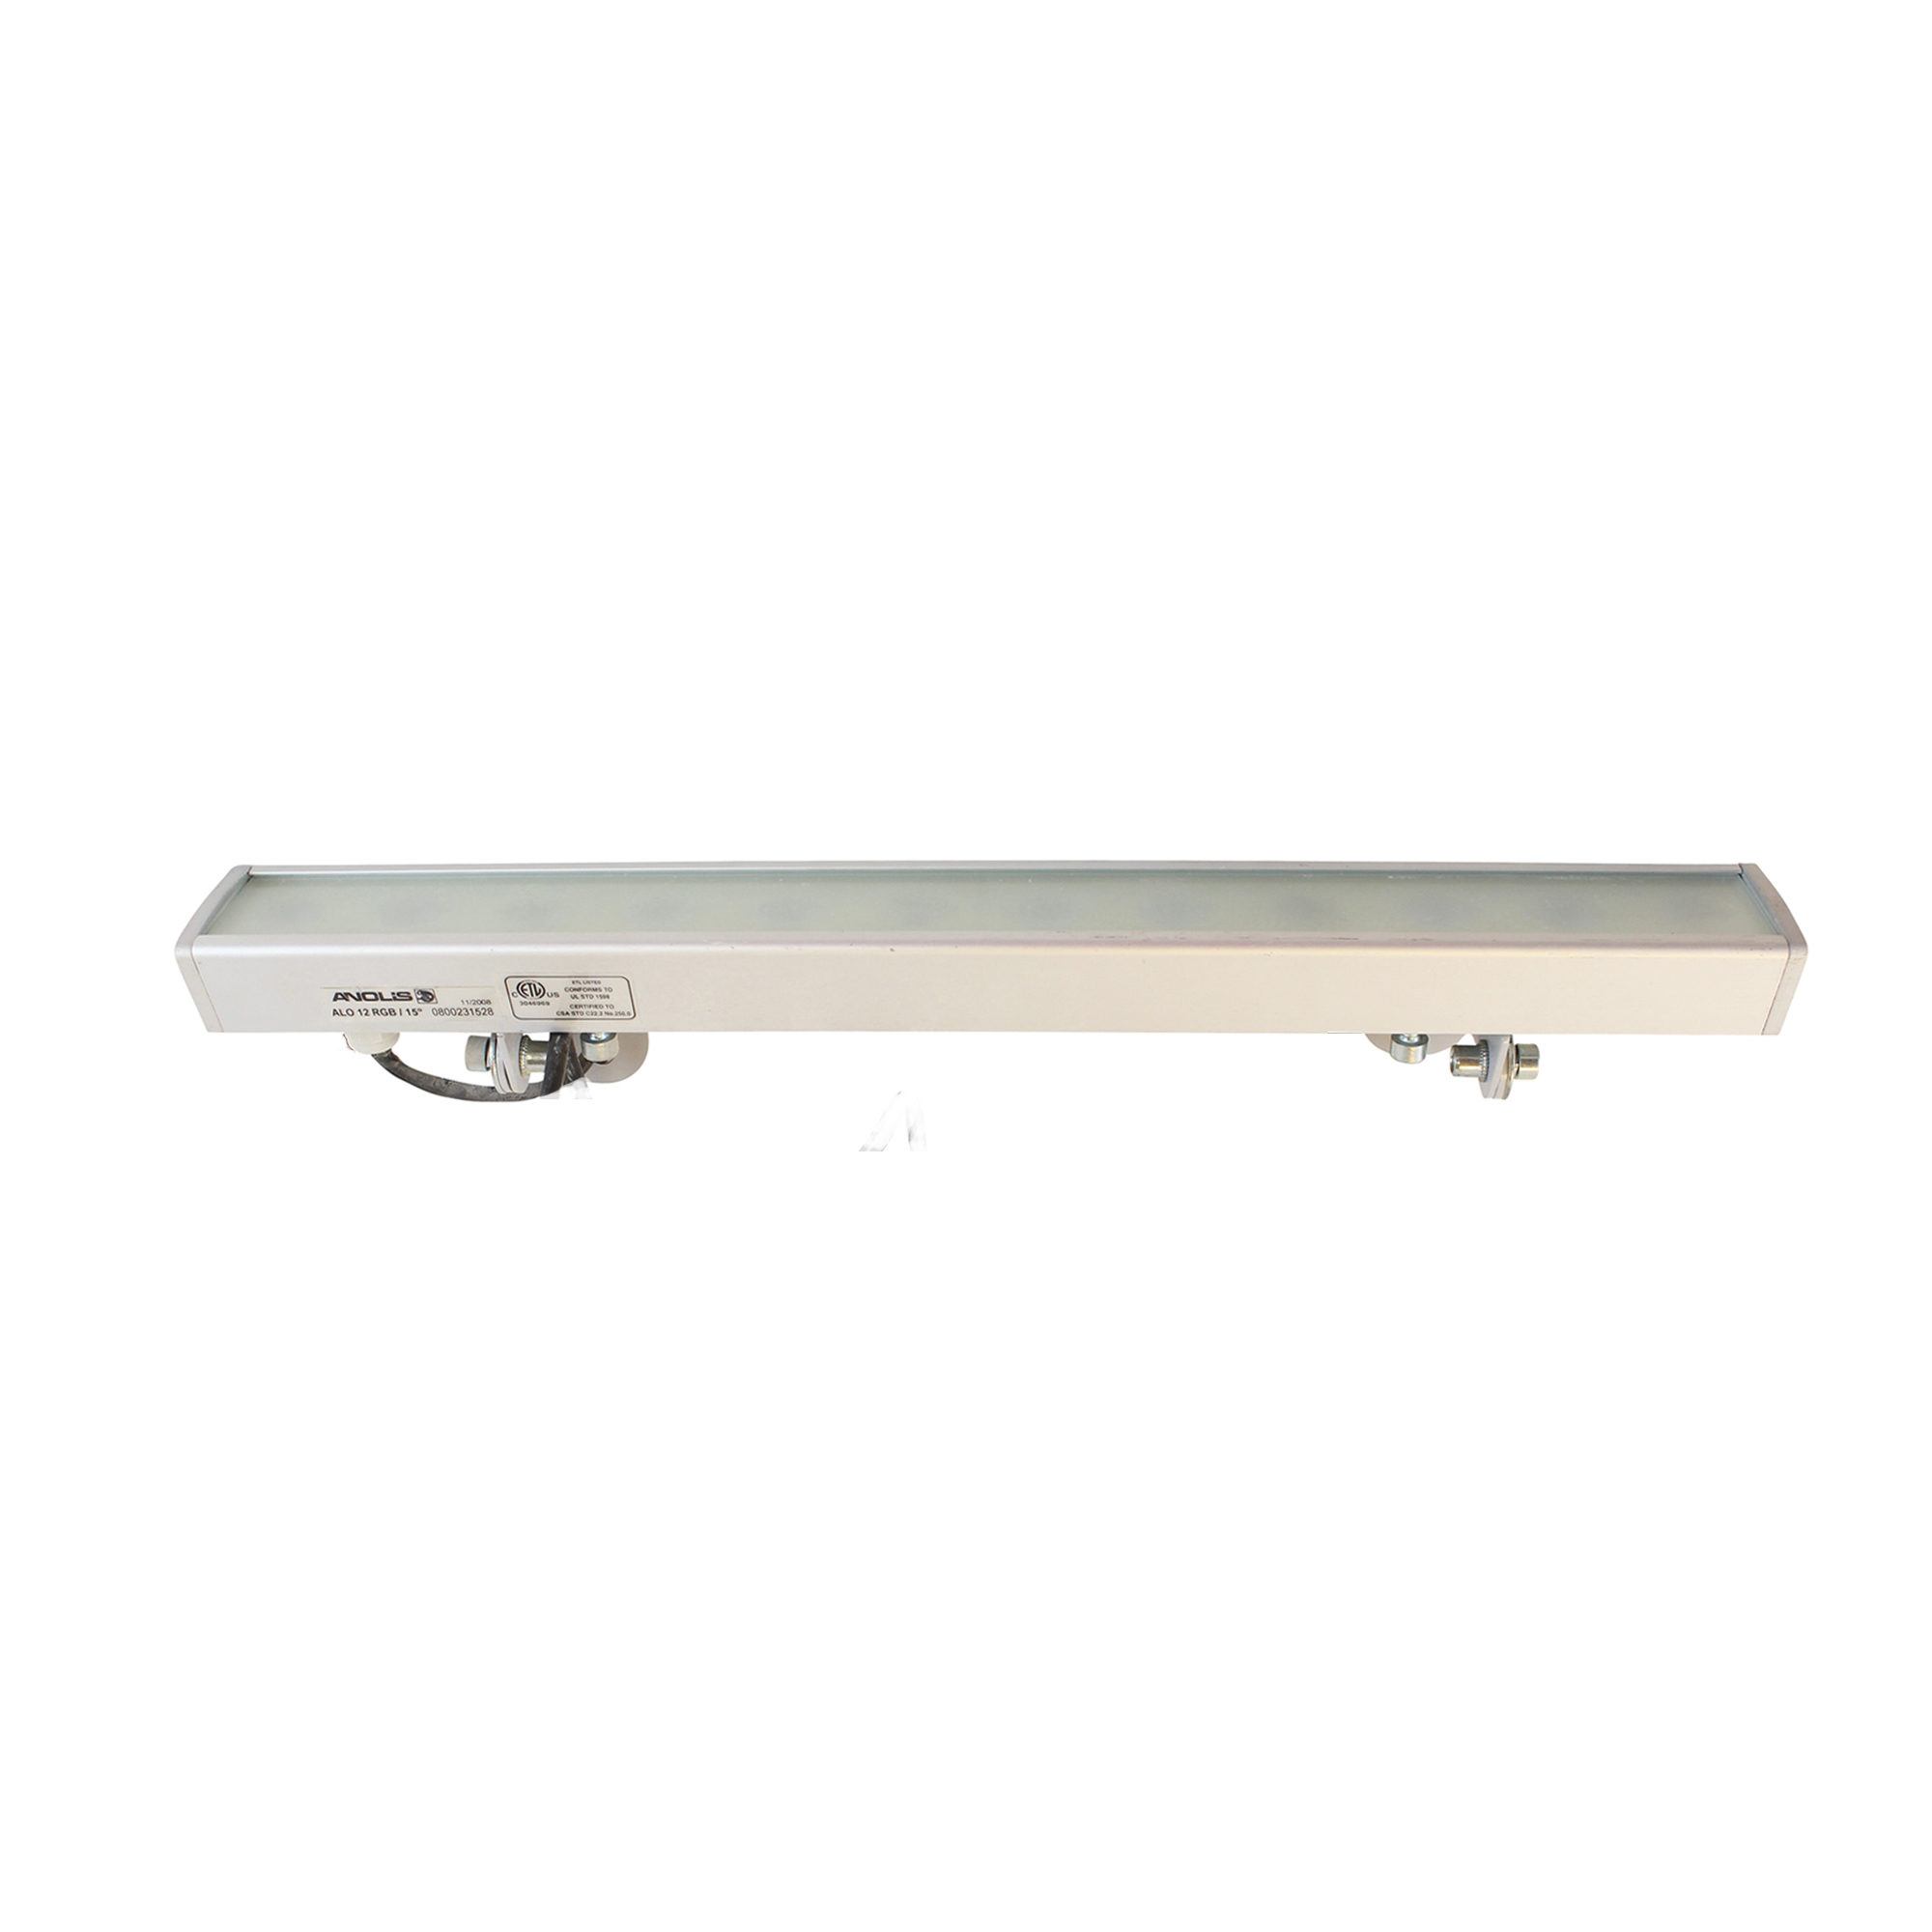 Led Light Fixture Bar: ANOLIS ARCLINE 12 Linear Led Light Bar, Rgb, 12-Inch, Rj45